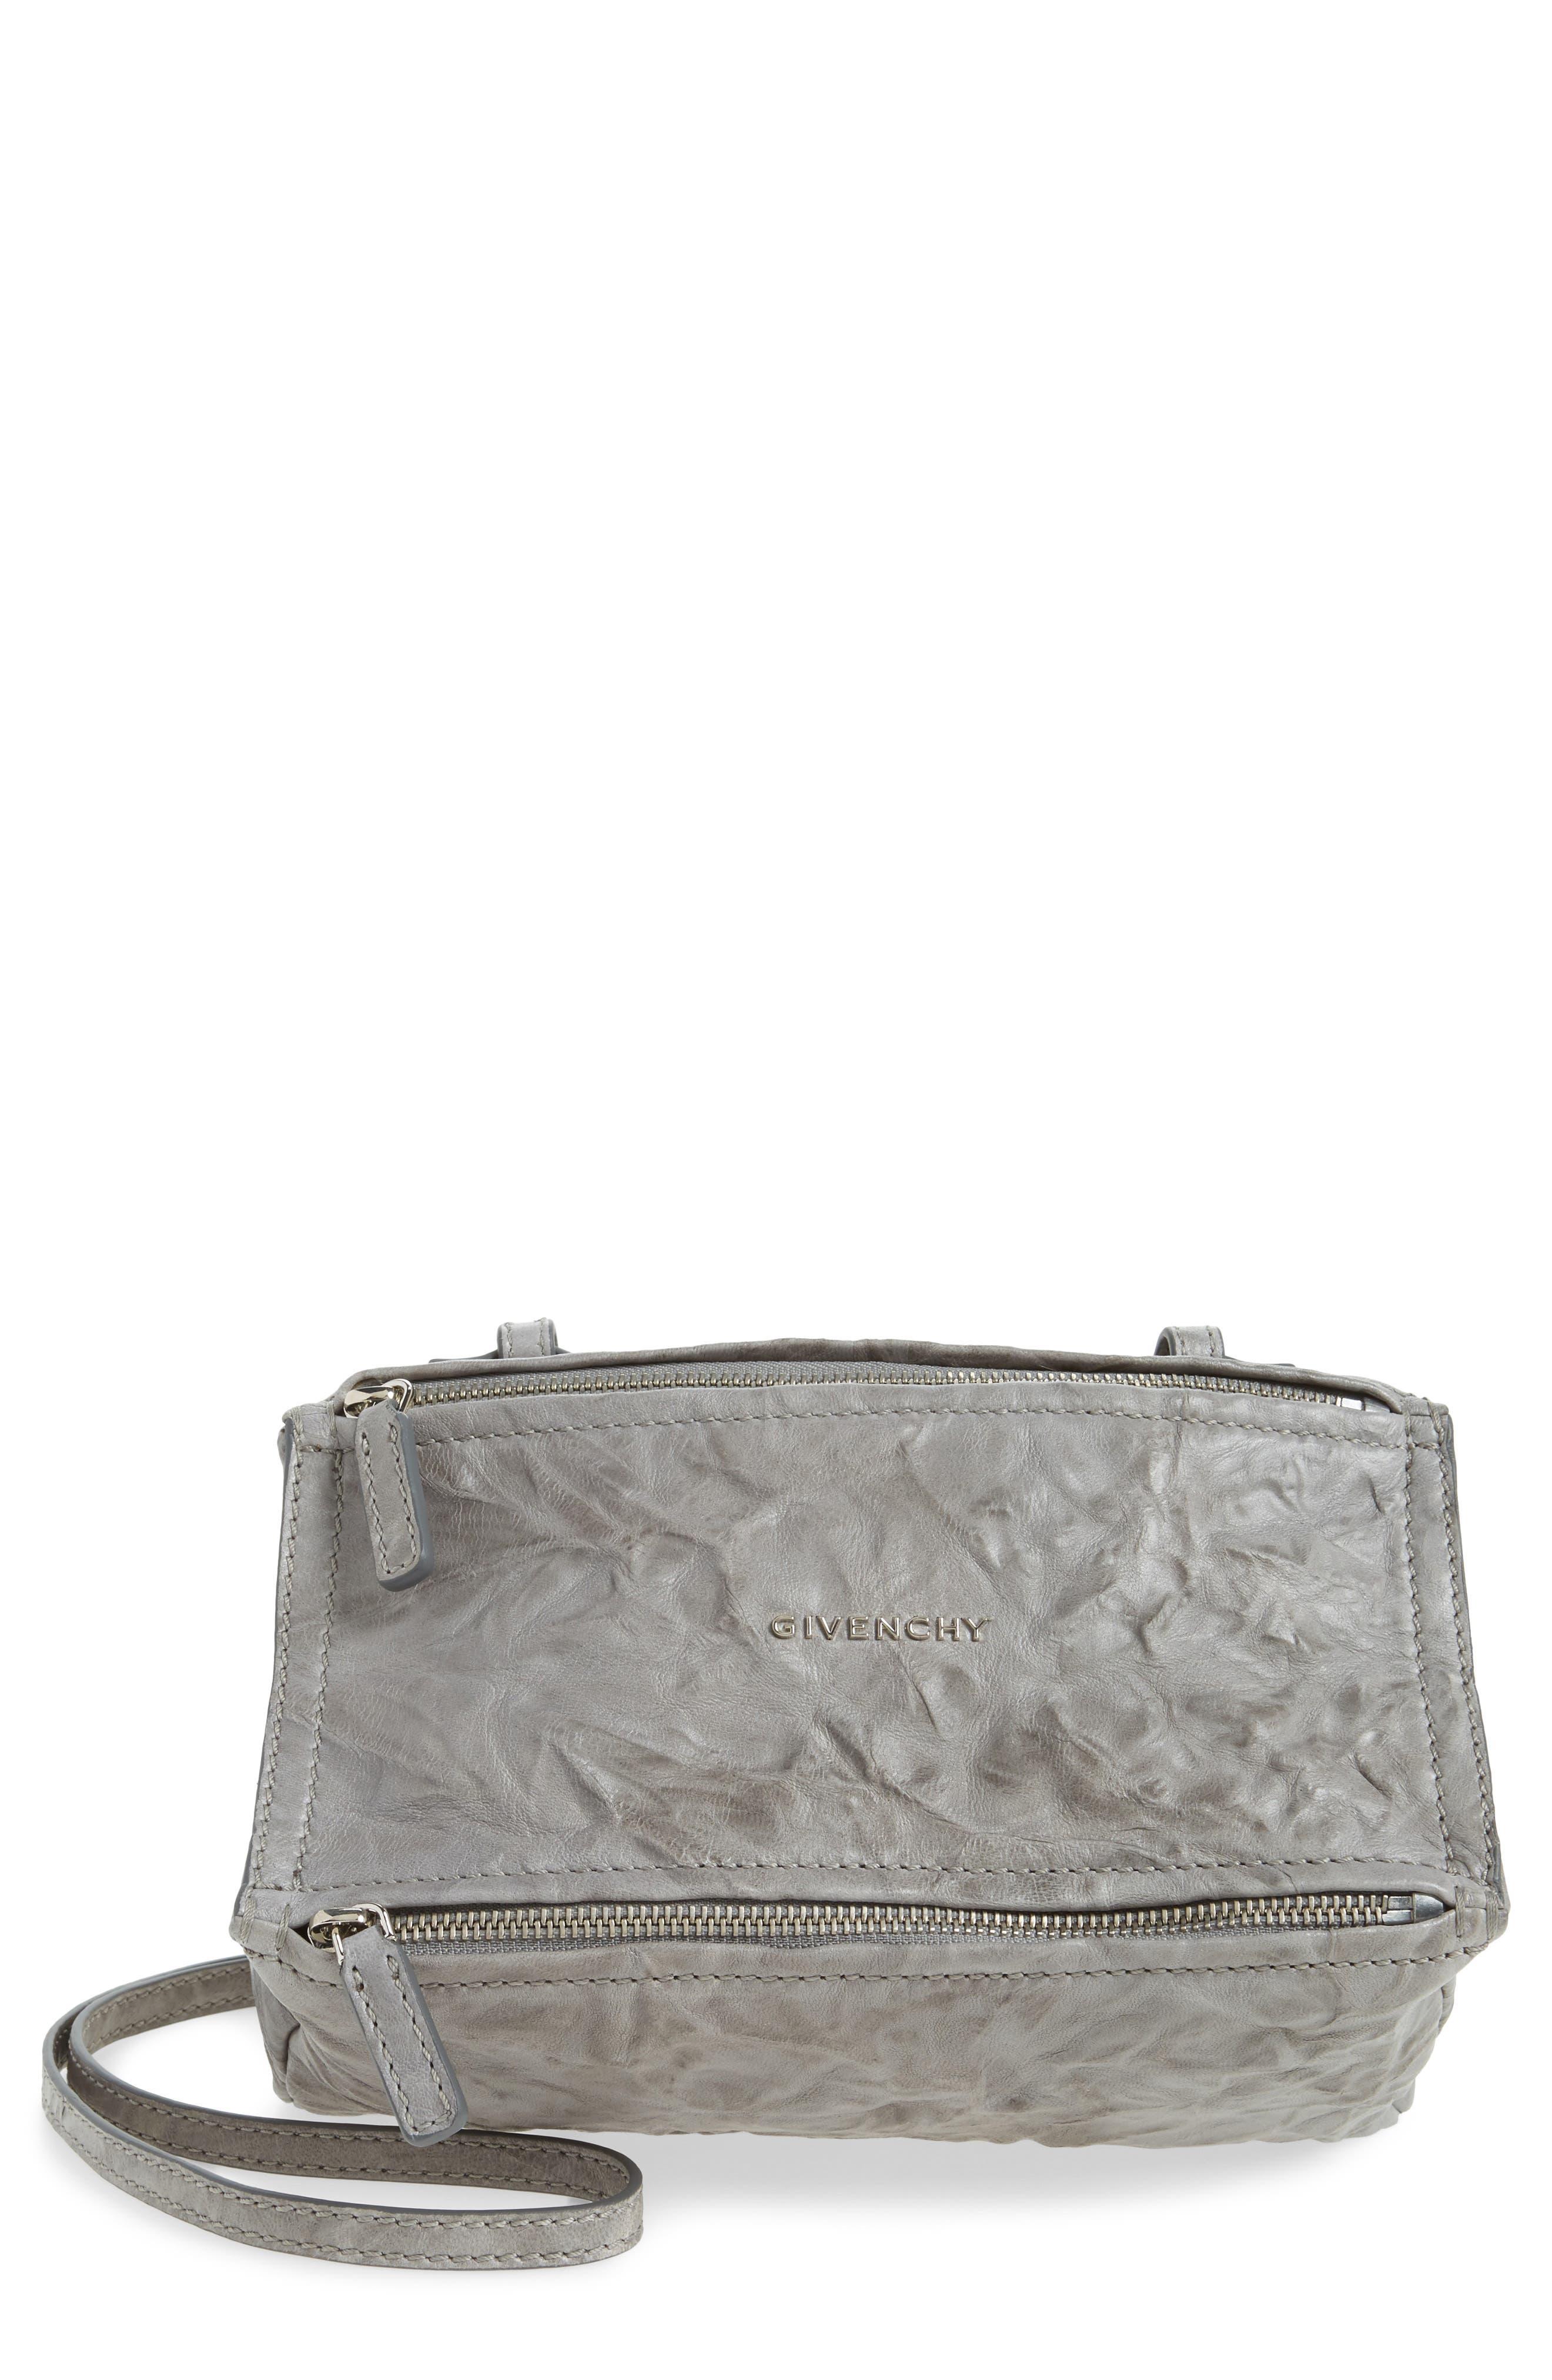 Alternate Image 1 Selected - Givenchy 'Mini Pepe Pandora' Leather Shoulder Bag